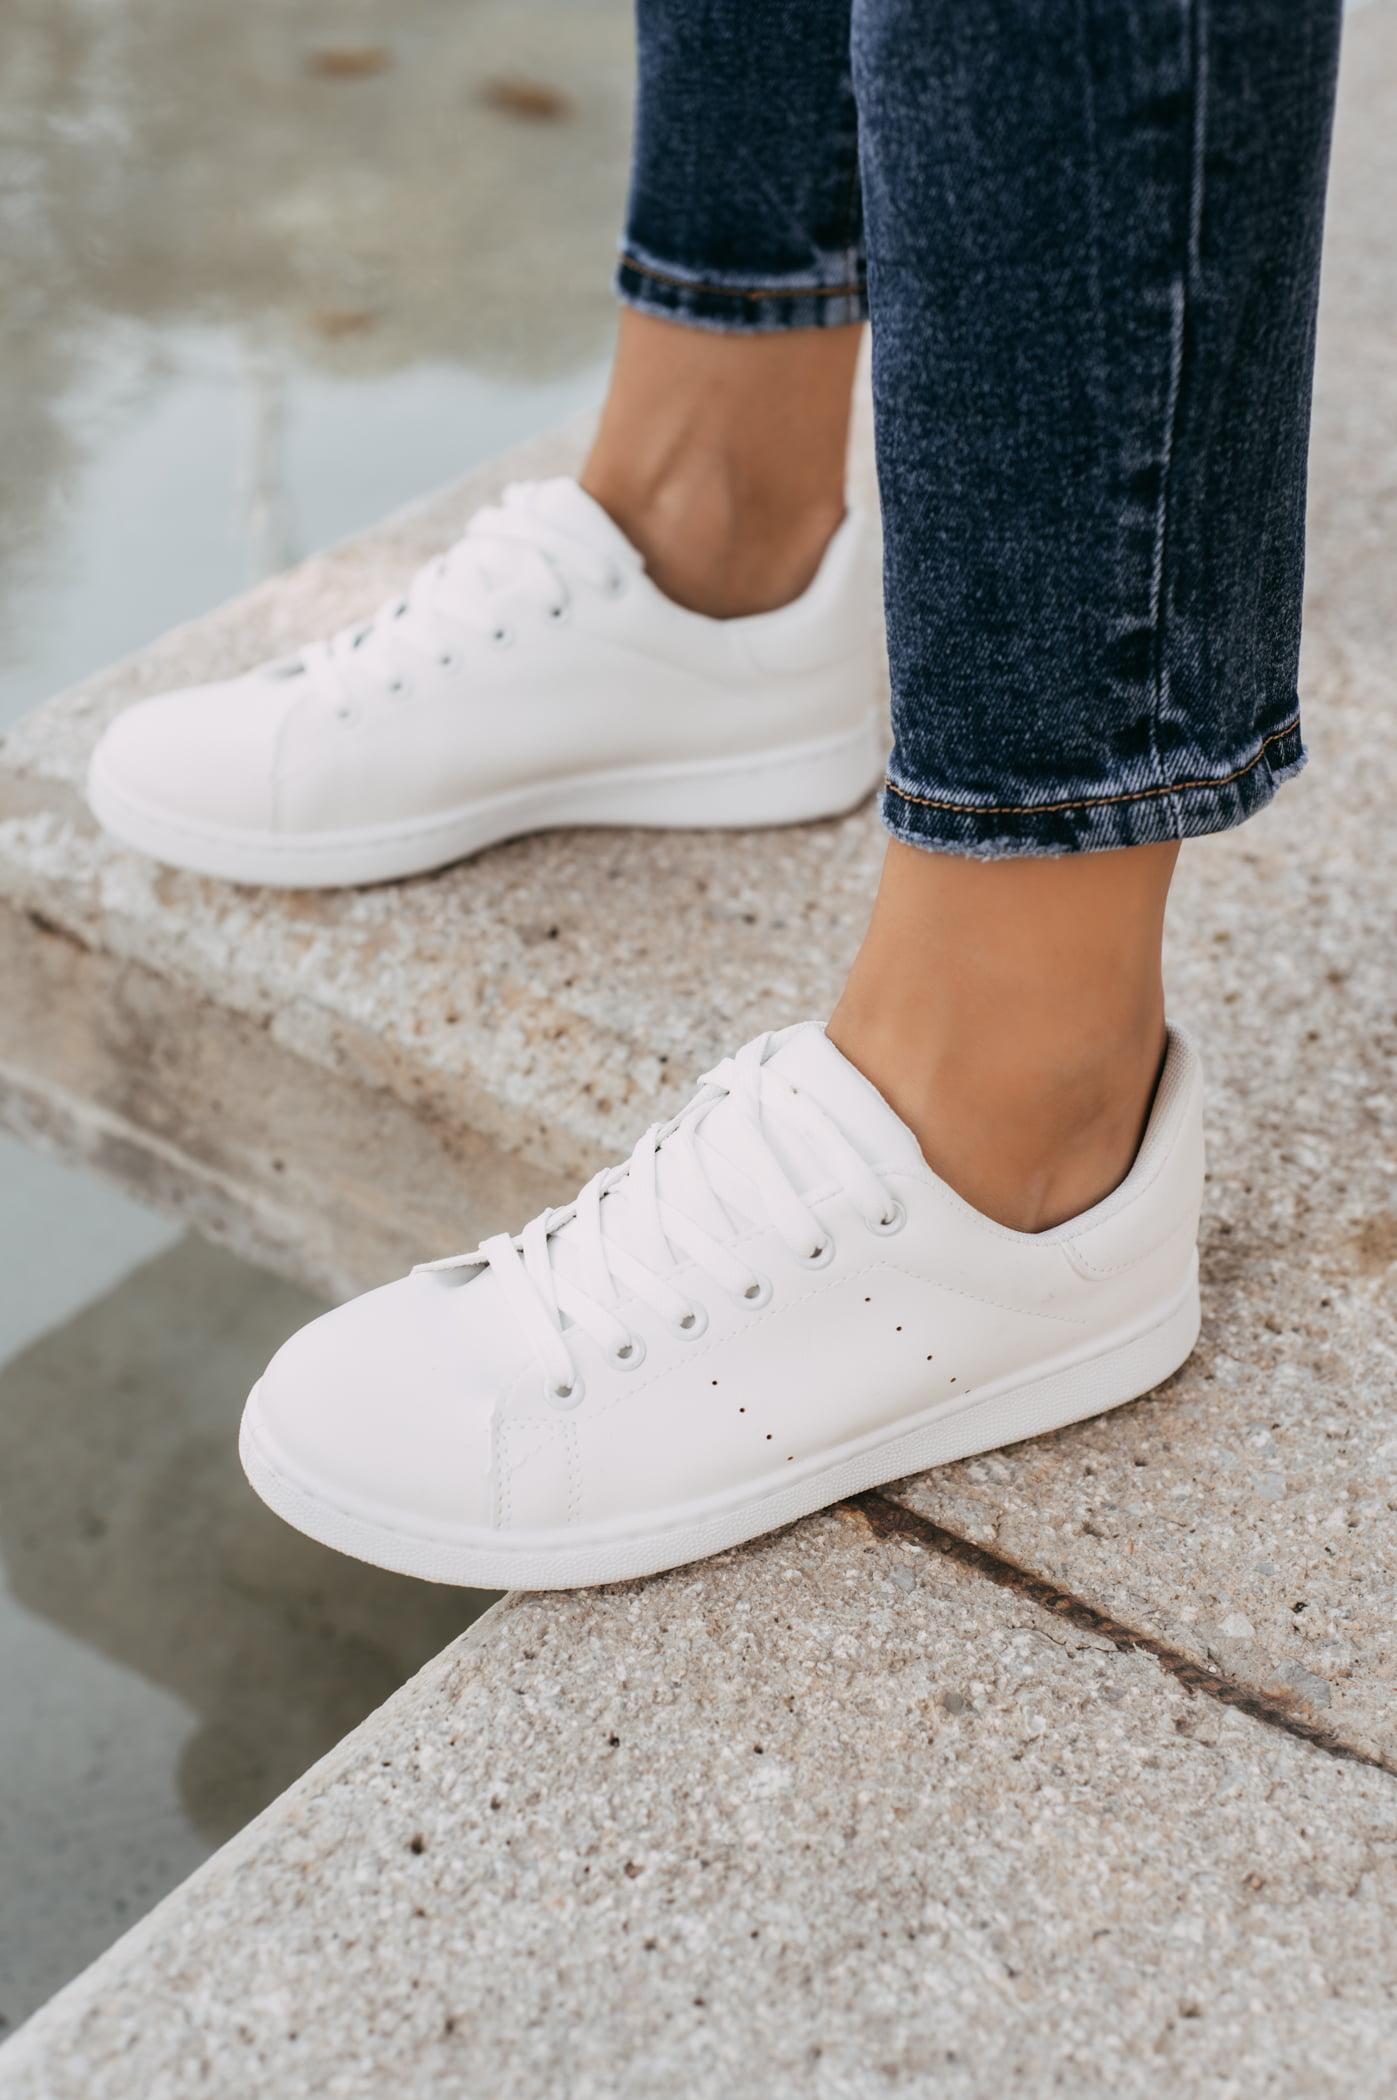 antithesis-clothing-sneakers-basic-leuka (2)